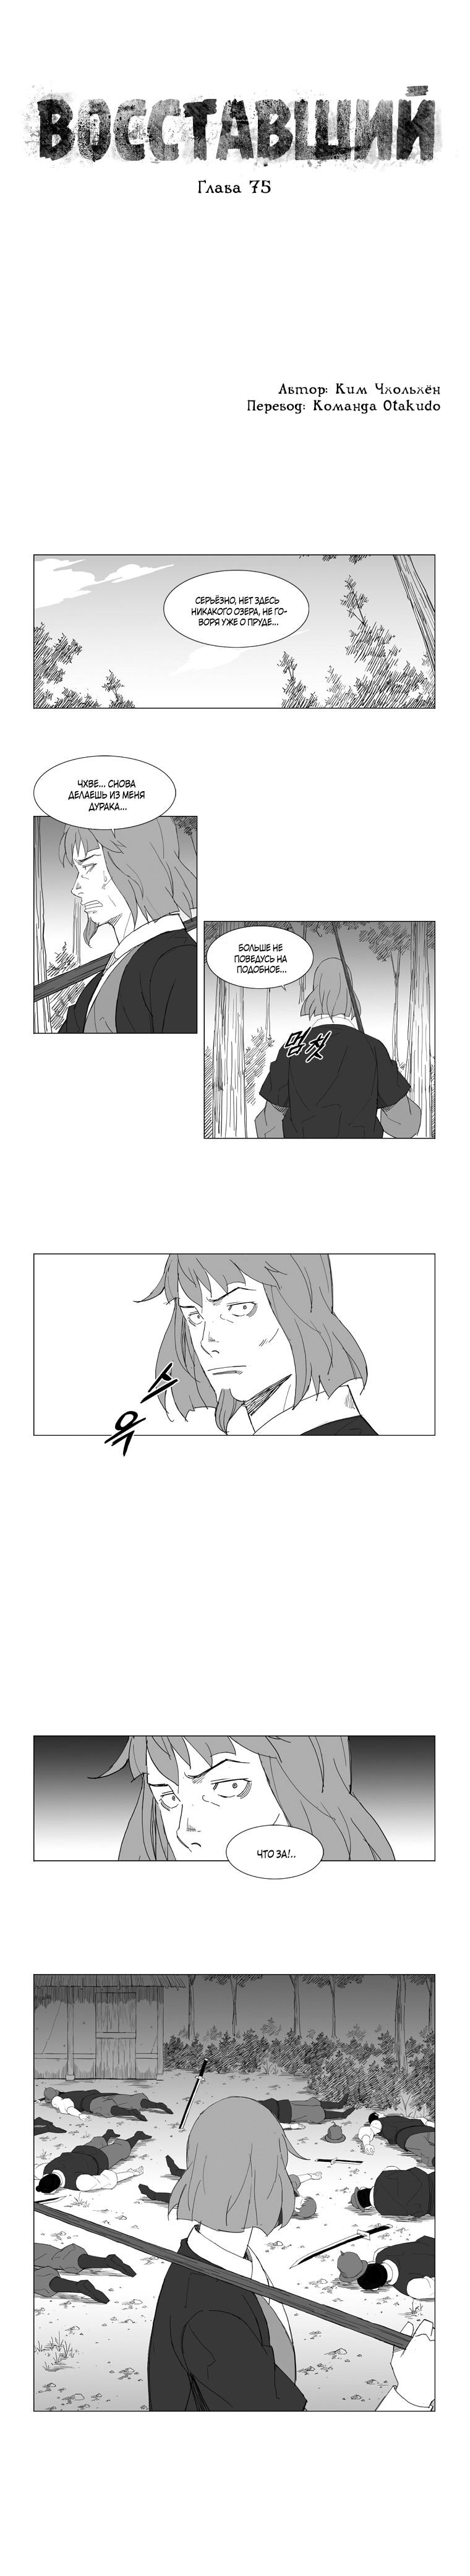 https://r1.ninemanga.com/comics/pic2/39/28263/336515/1509639291536.jpg Page 1